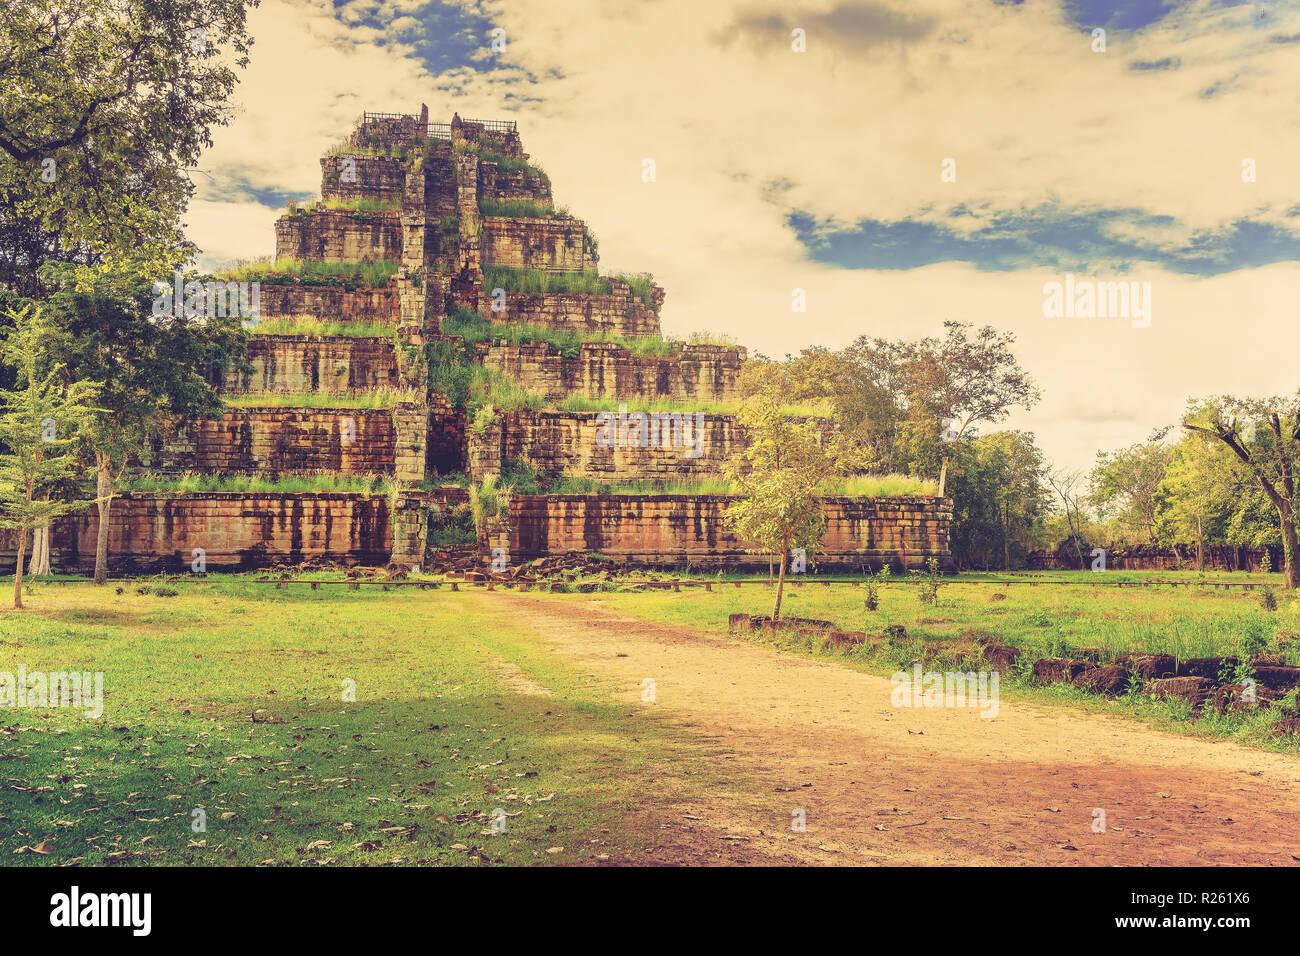 Pyramid death Prasat Thom Koh Ker lost in tropical rain forest jungle Cambodia - Stock Image